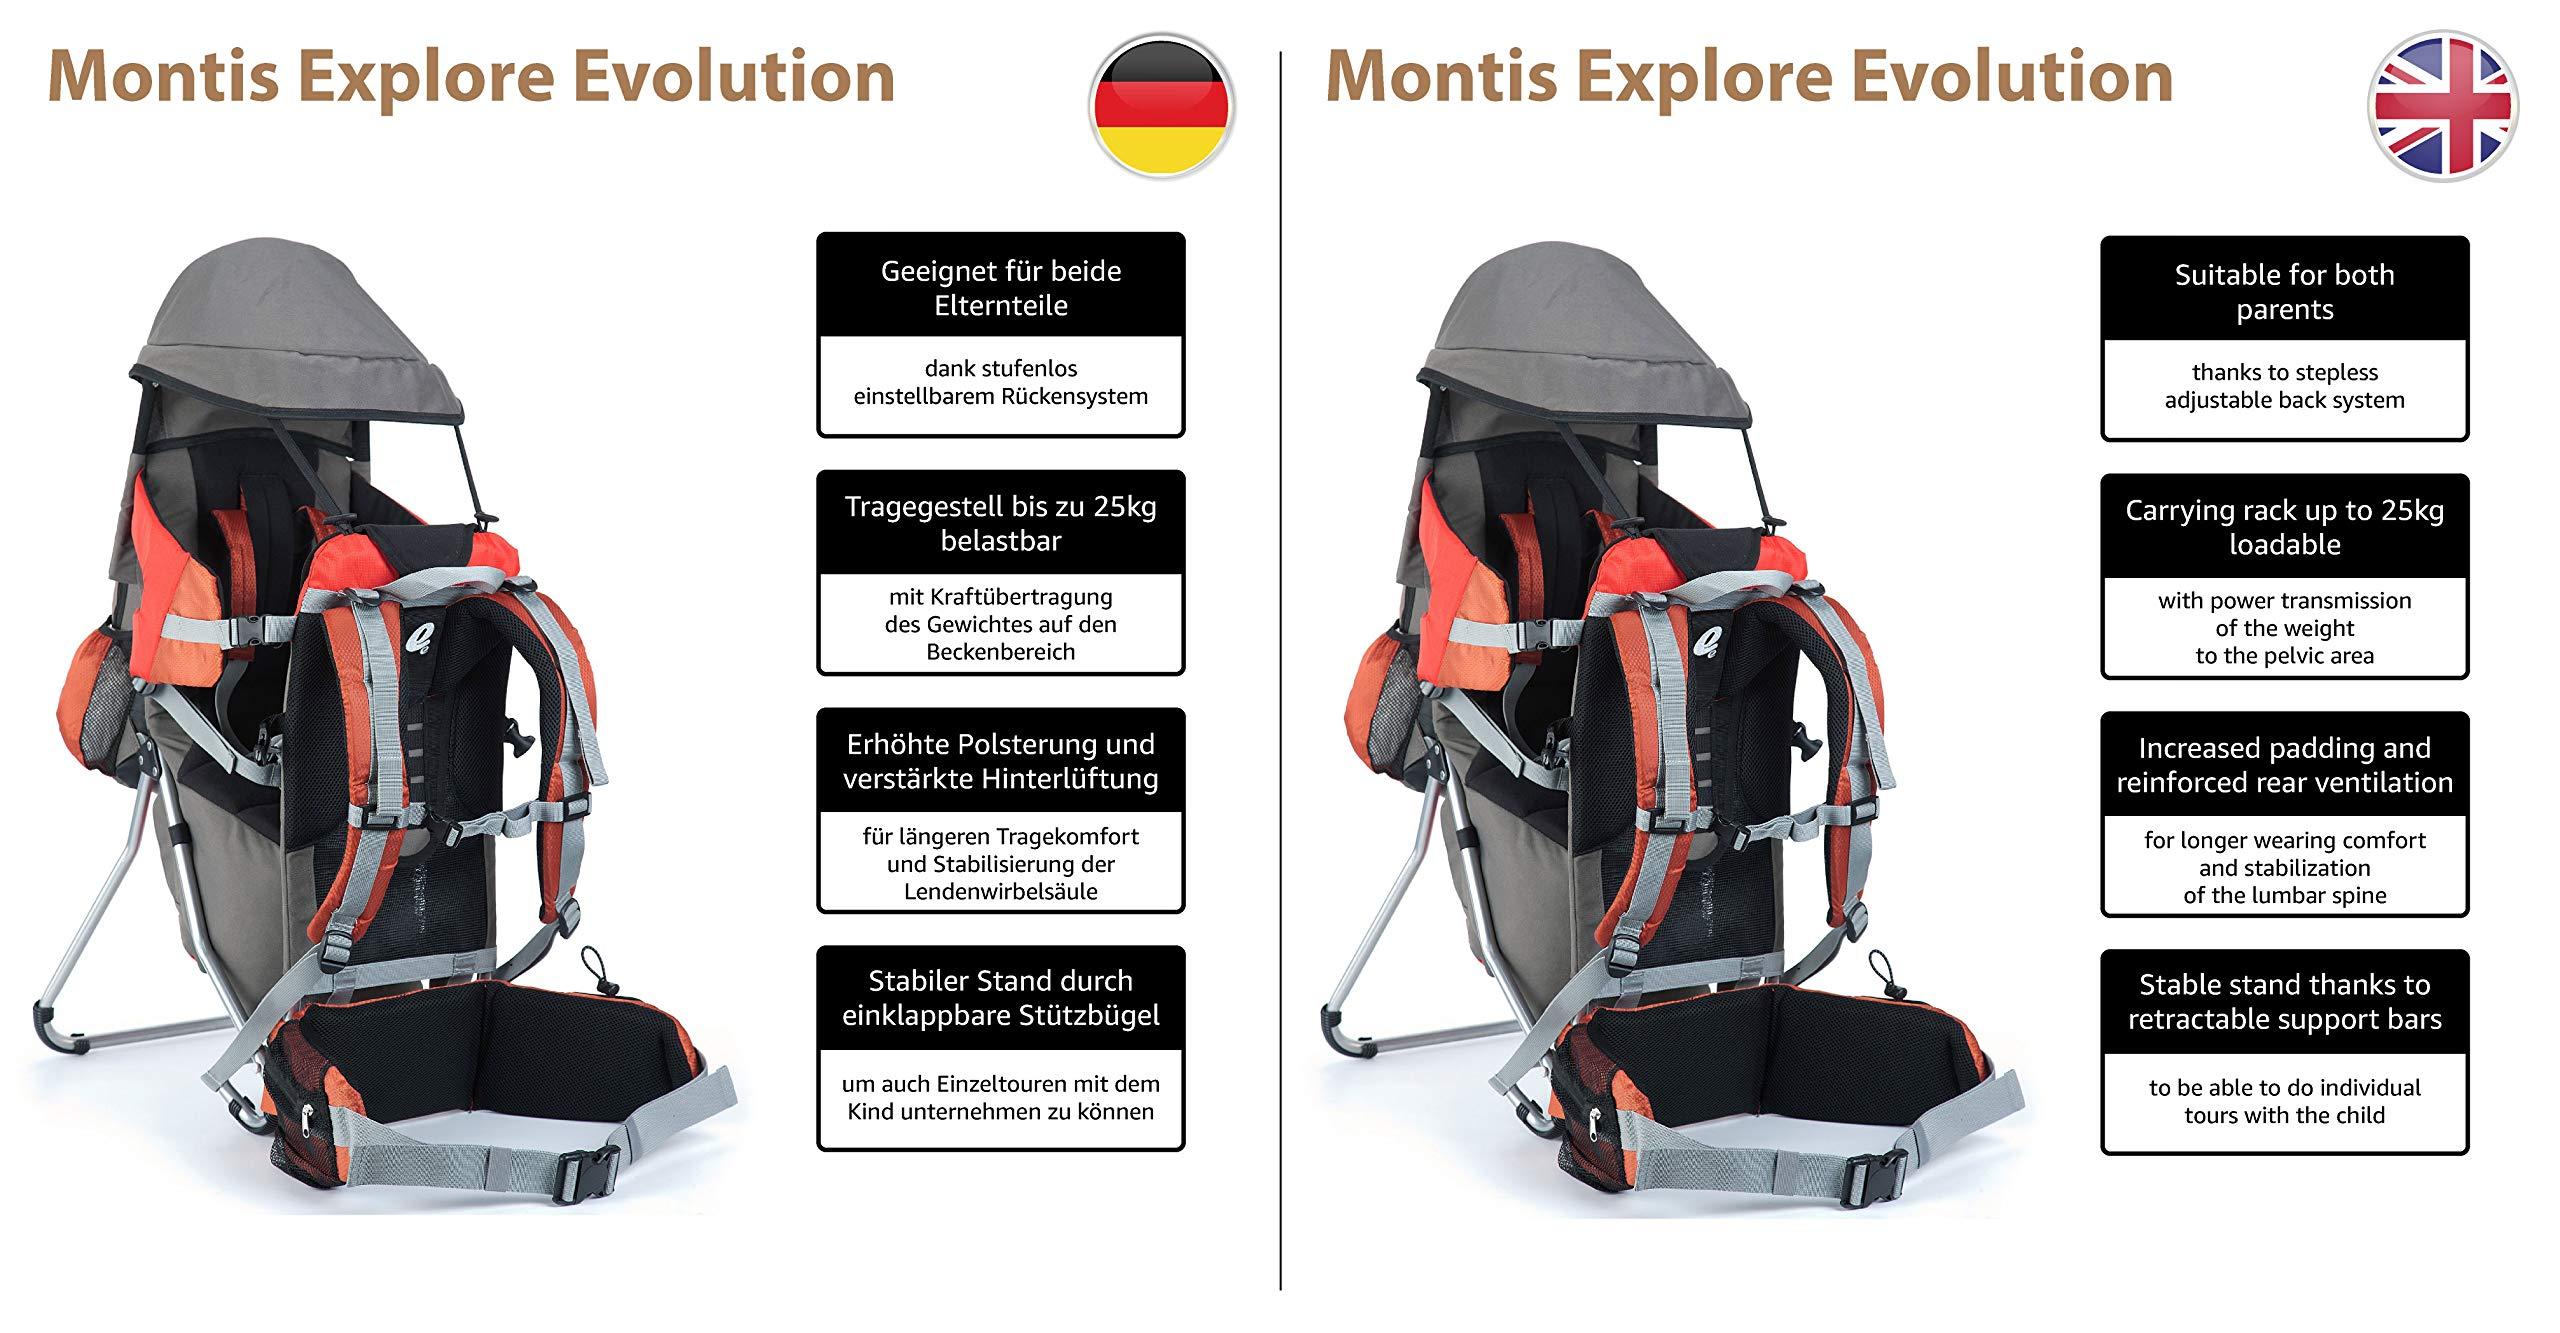 813HbFm5tSL - Montis Explore Evolution - Mochila portabebés (Carga máxima de 25 kg), Color Naranja y Rojo (2000 gr)